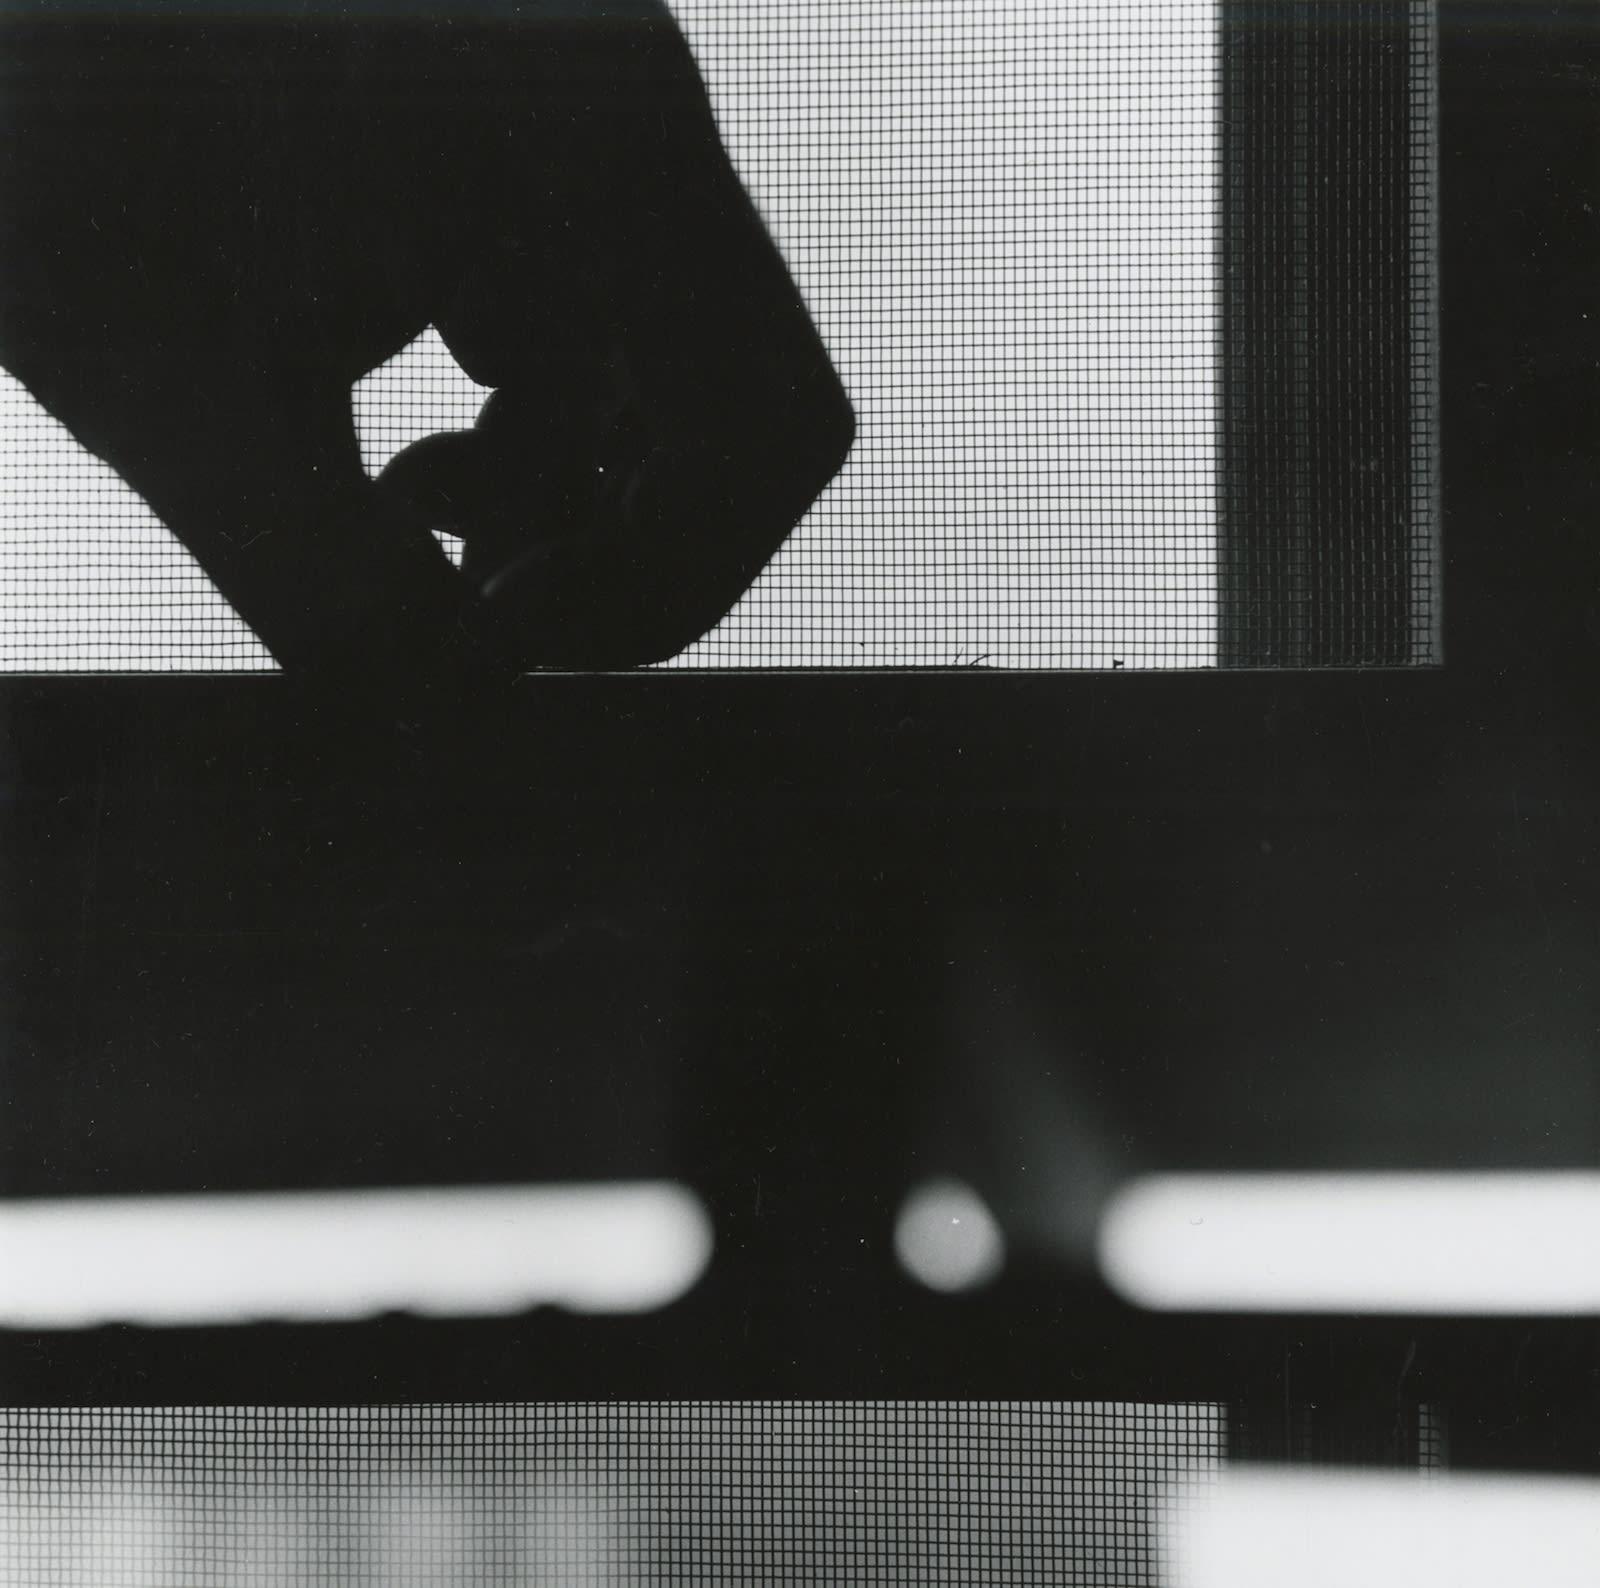 Ray K. Metzker, Chicago - Non Loop, 1957